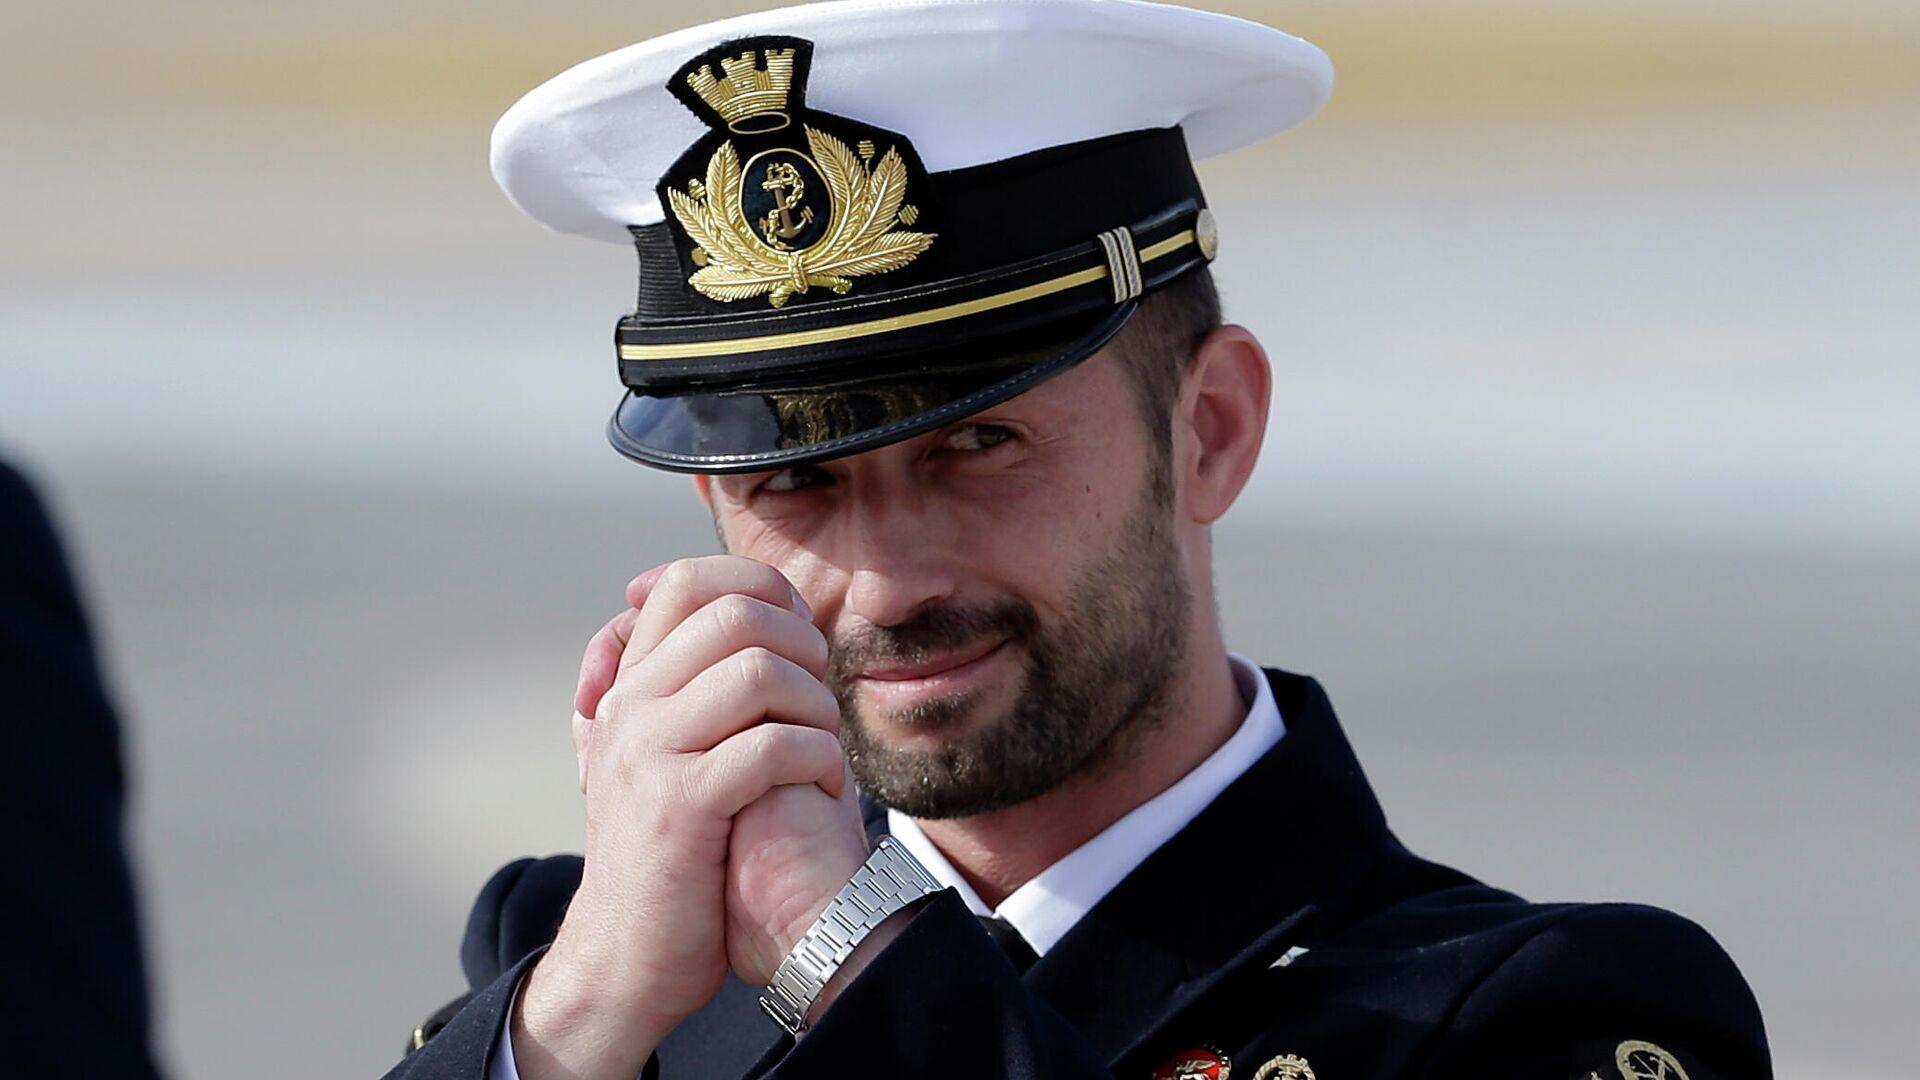 Salvatore Girone, miembro del regimiento San Marco de la Marina Militar Italiana - Sputnik Mundo, 1920, 15.06.2021